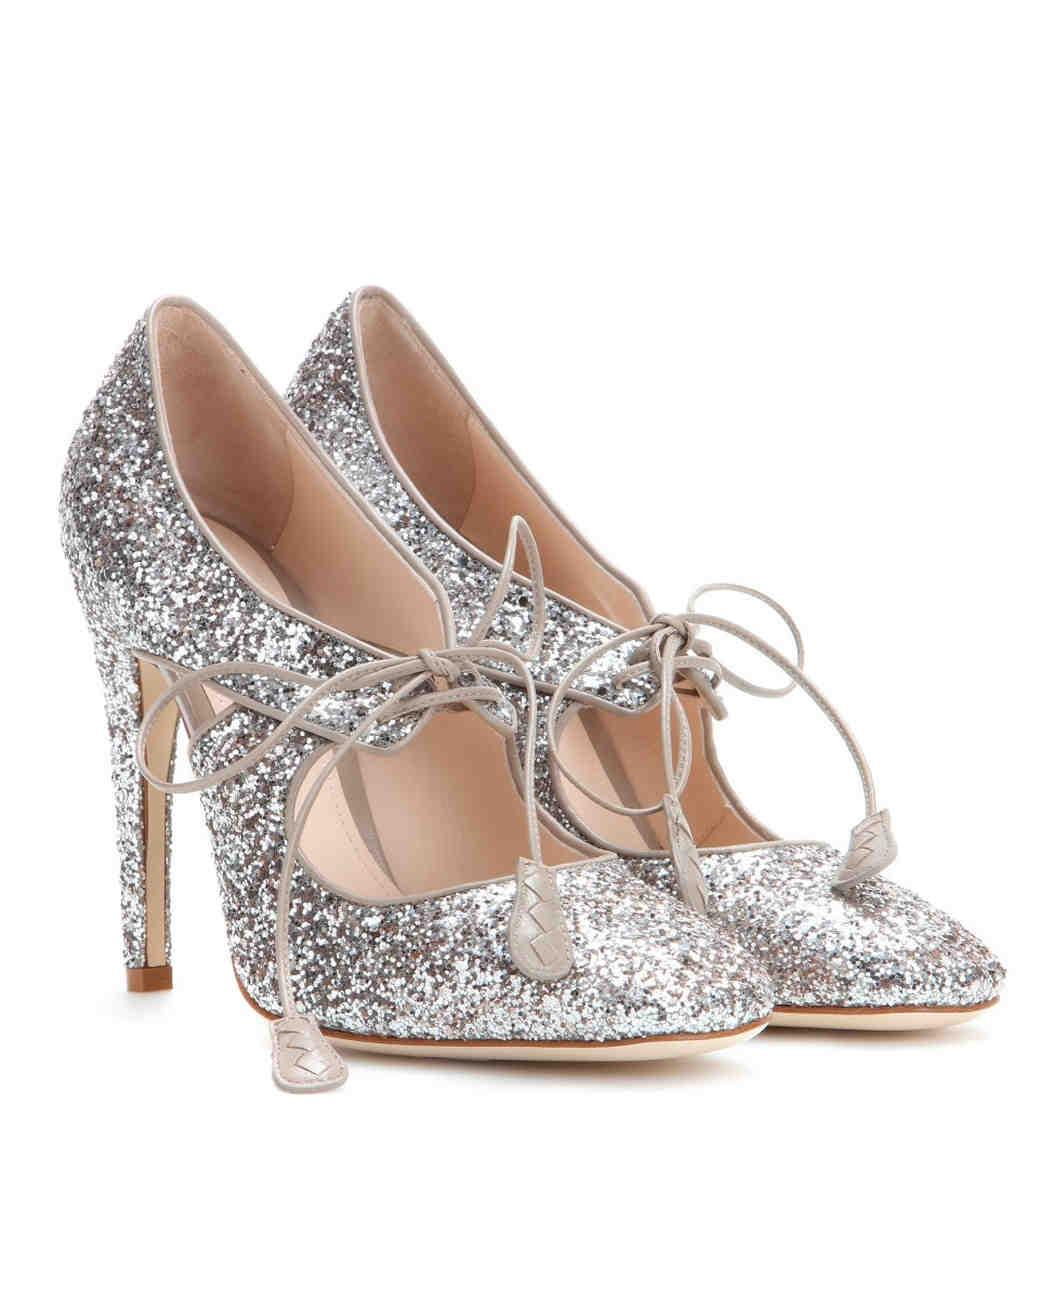 summer-wedding-shoes-bottega-veneta-glitter-pumps-0515.jpg